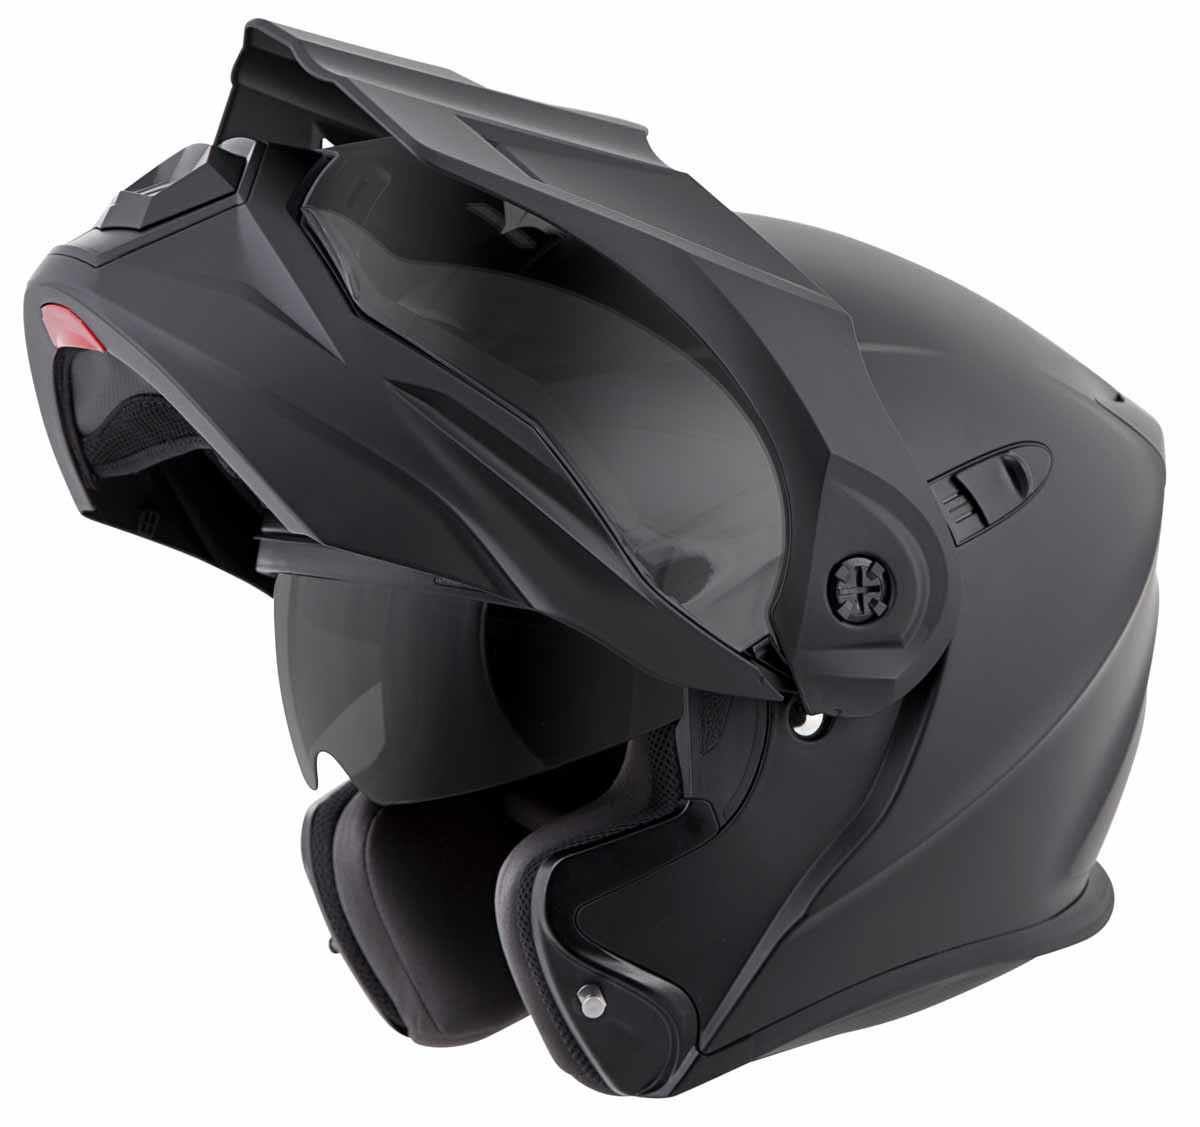 Scorpion-EXO-AT950-Helmet-Flip-Up-Modular-Dual-Sport-Adventure-ADV-DOT-XS-3XL miniature 11